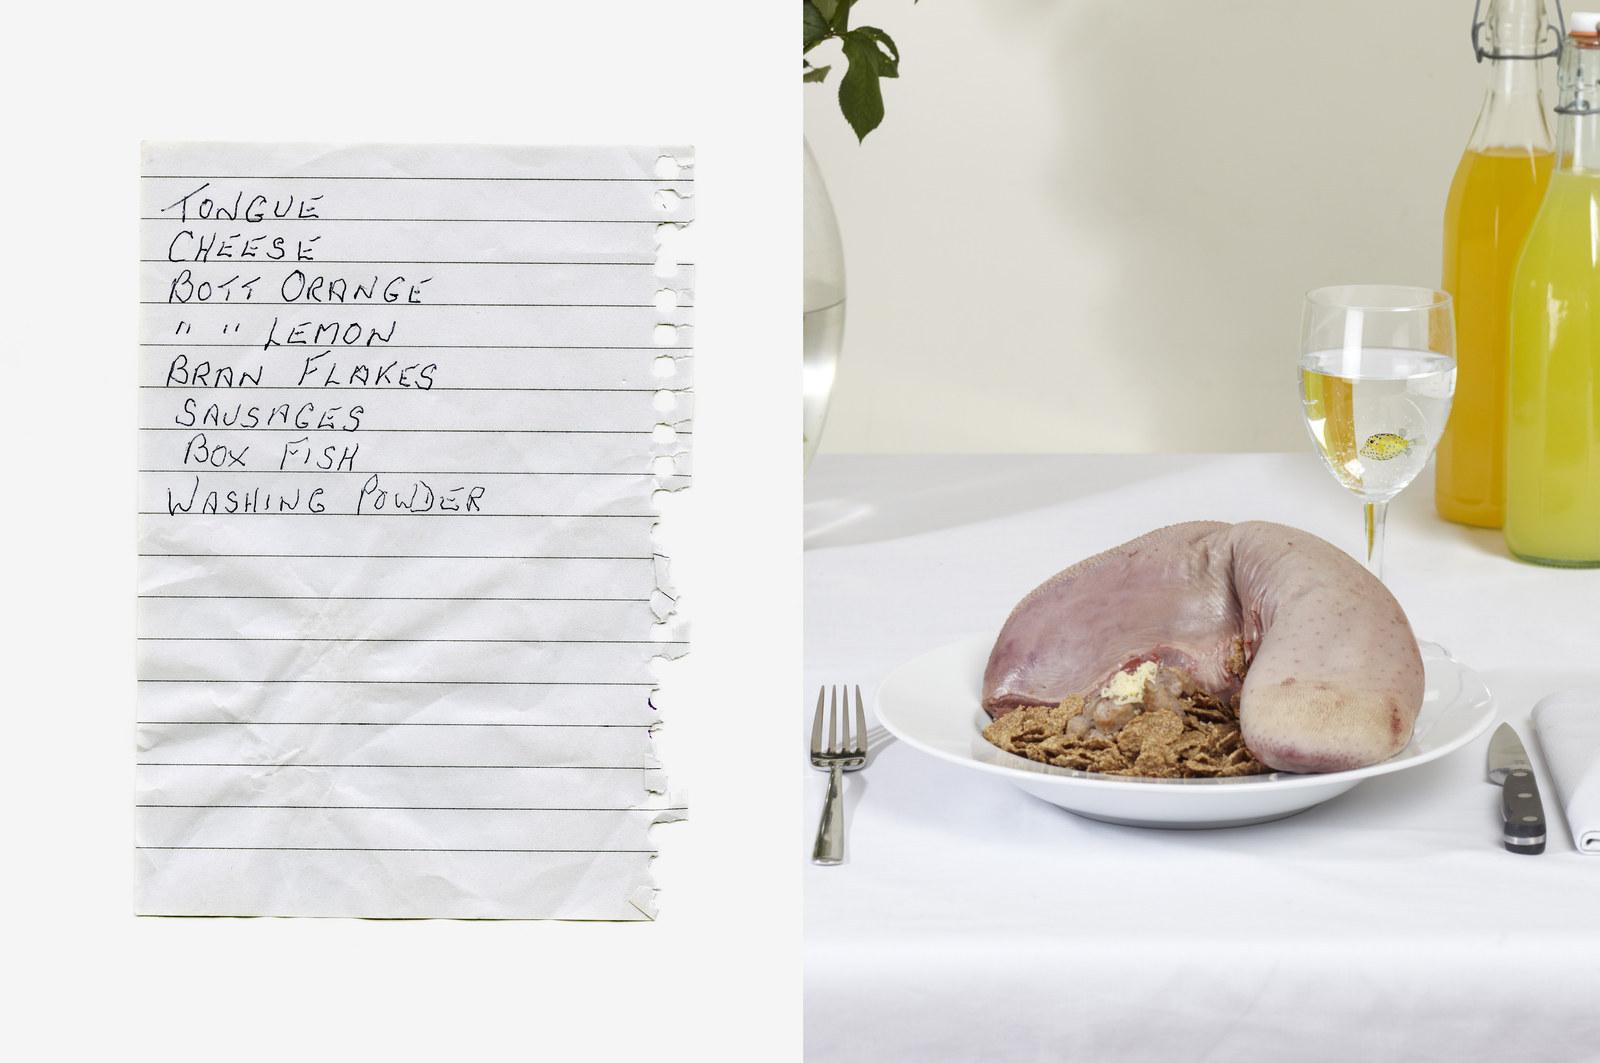 thomas_lakeman_shopping_list_cookbook_07